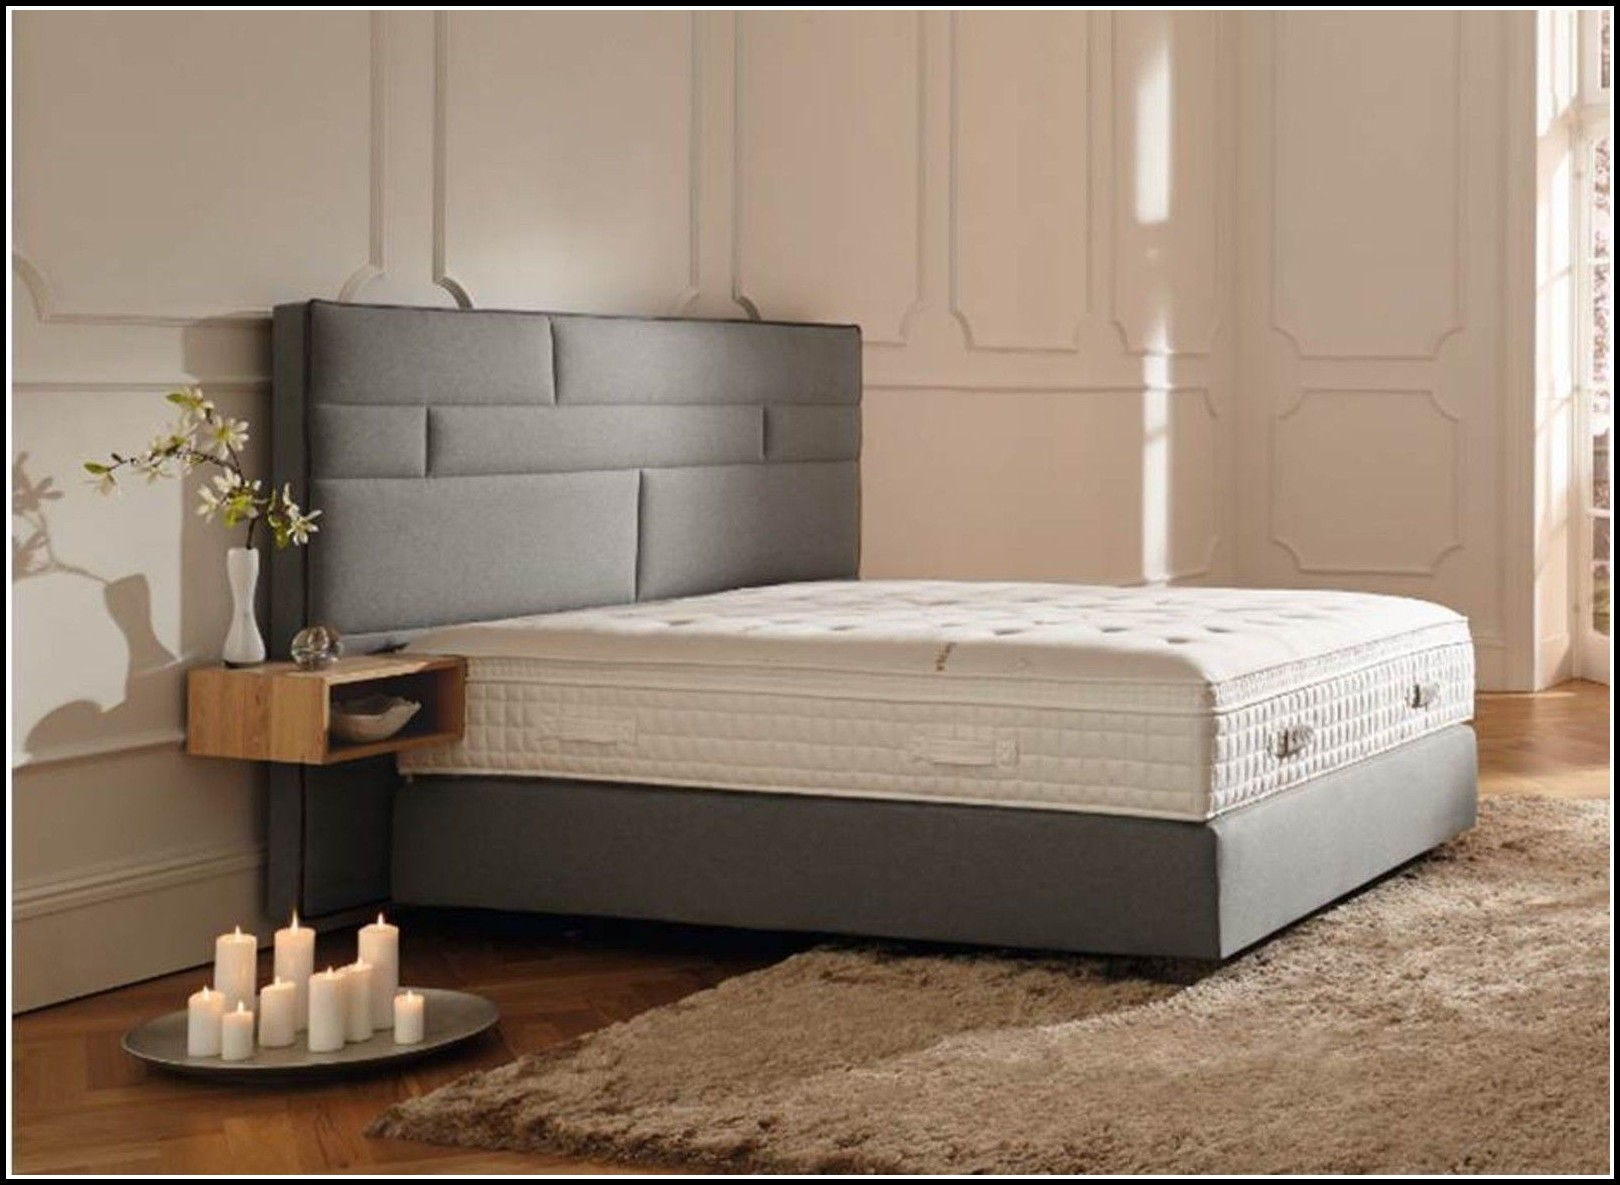 bett 120 x 200 hulsta download page beste wohnideen galerie. Black Bedroom Furniture Sets. Home Design Ideas